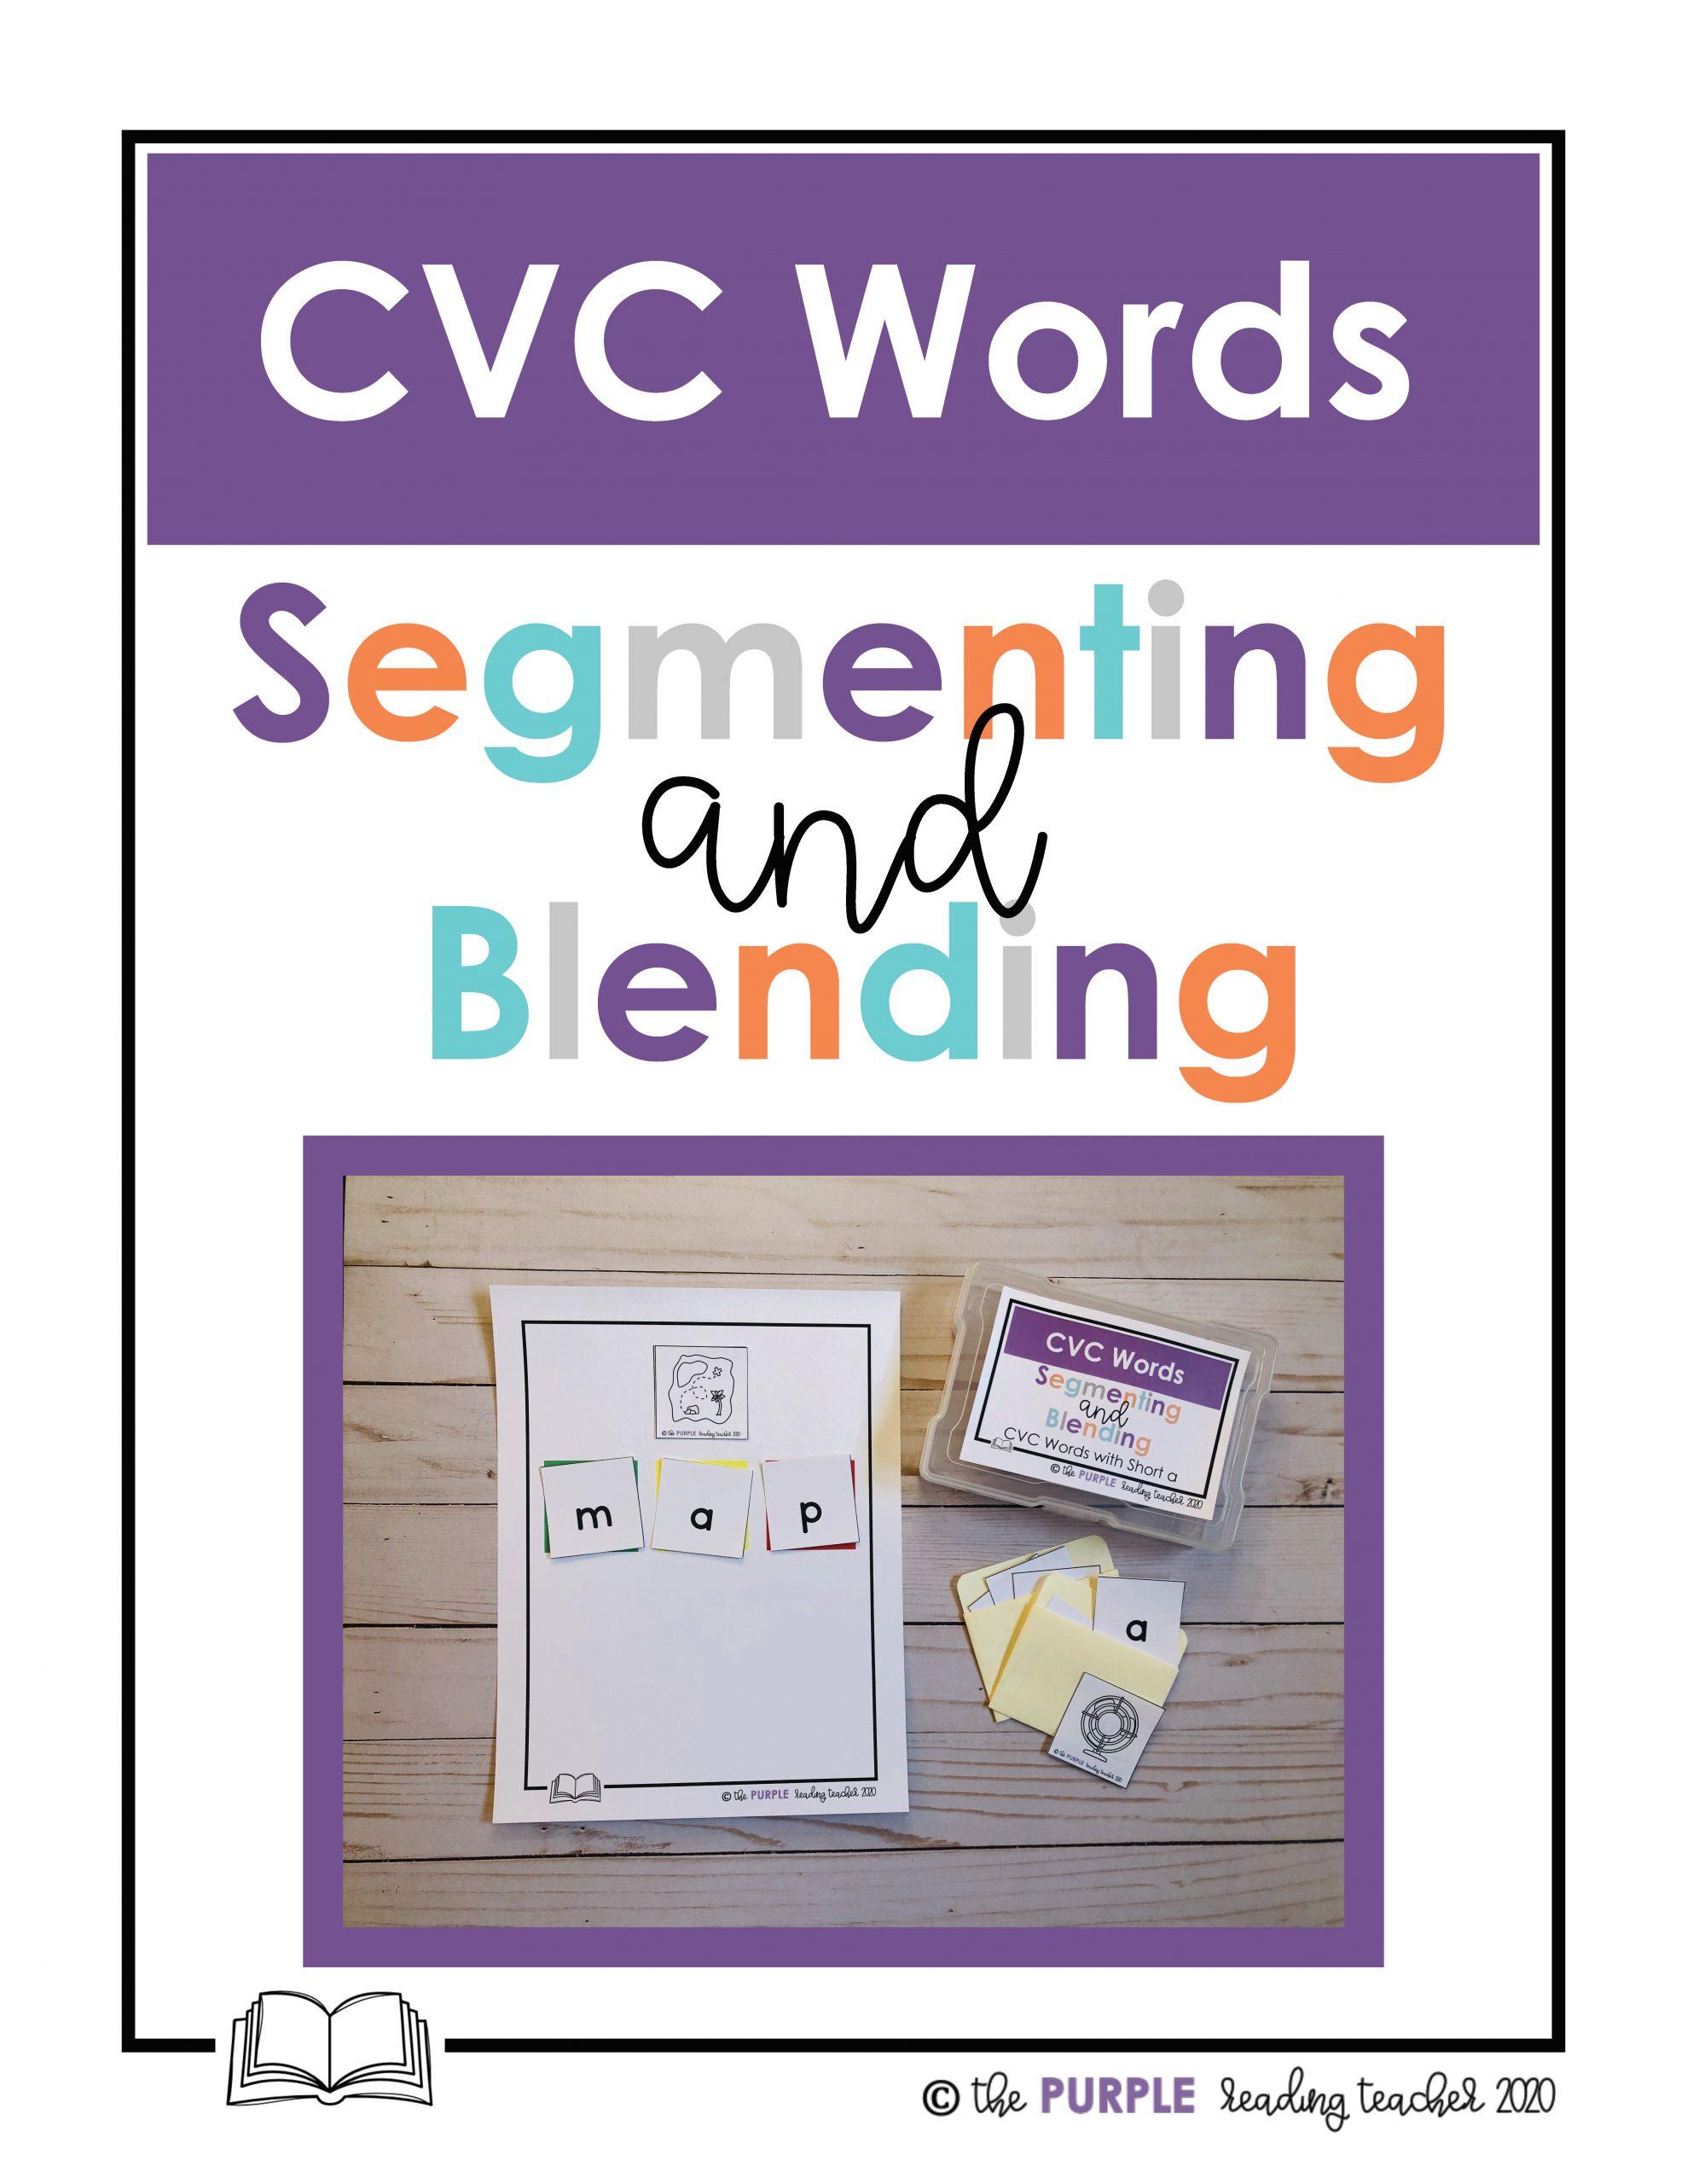 CVC-Words-Segmenting-and-Blending